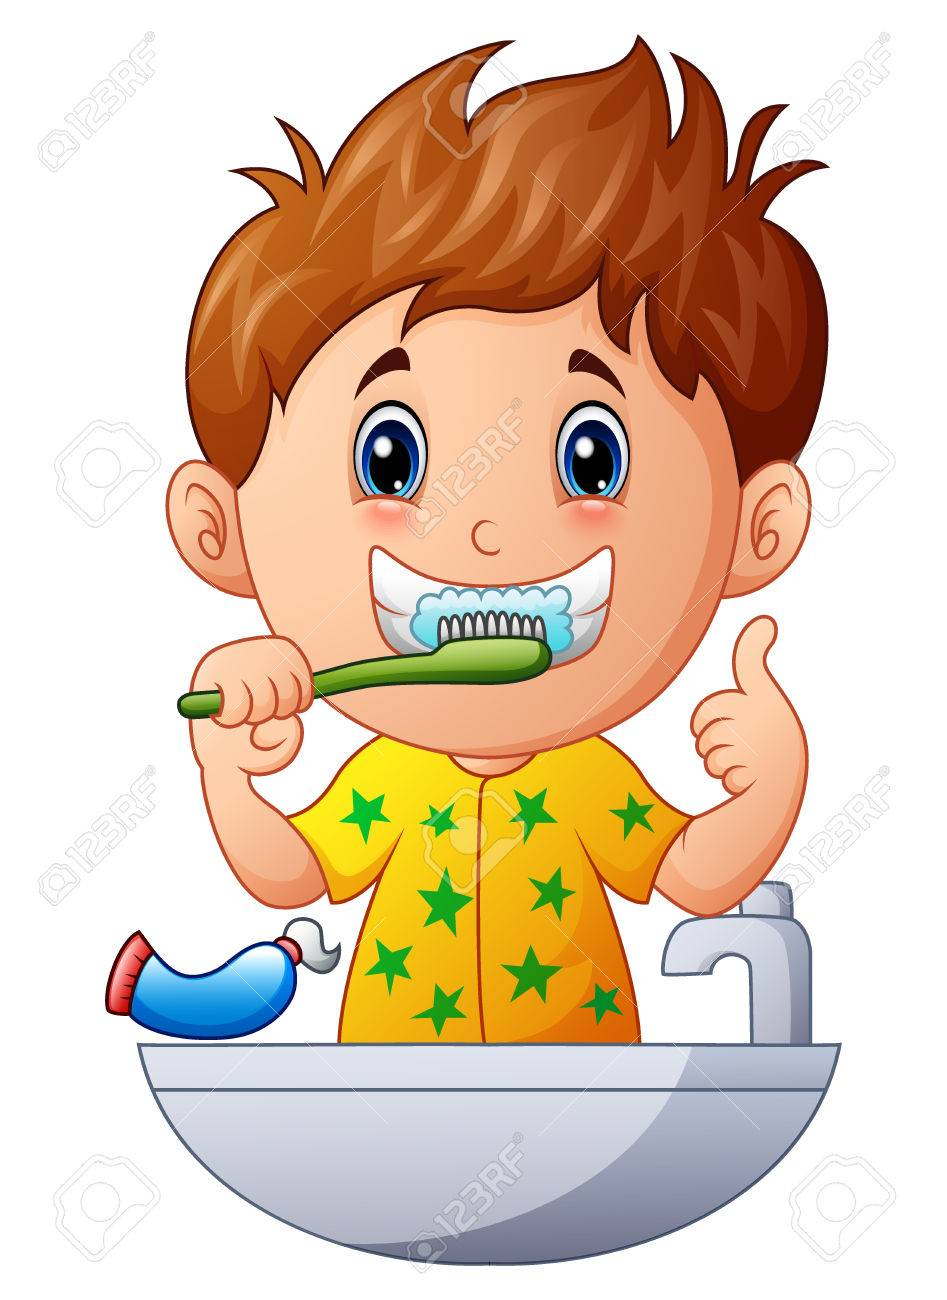 Vector illustration of Cute boy brushing teeth.